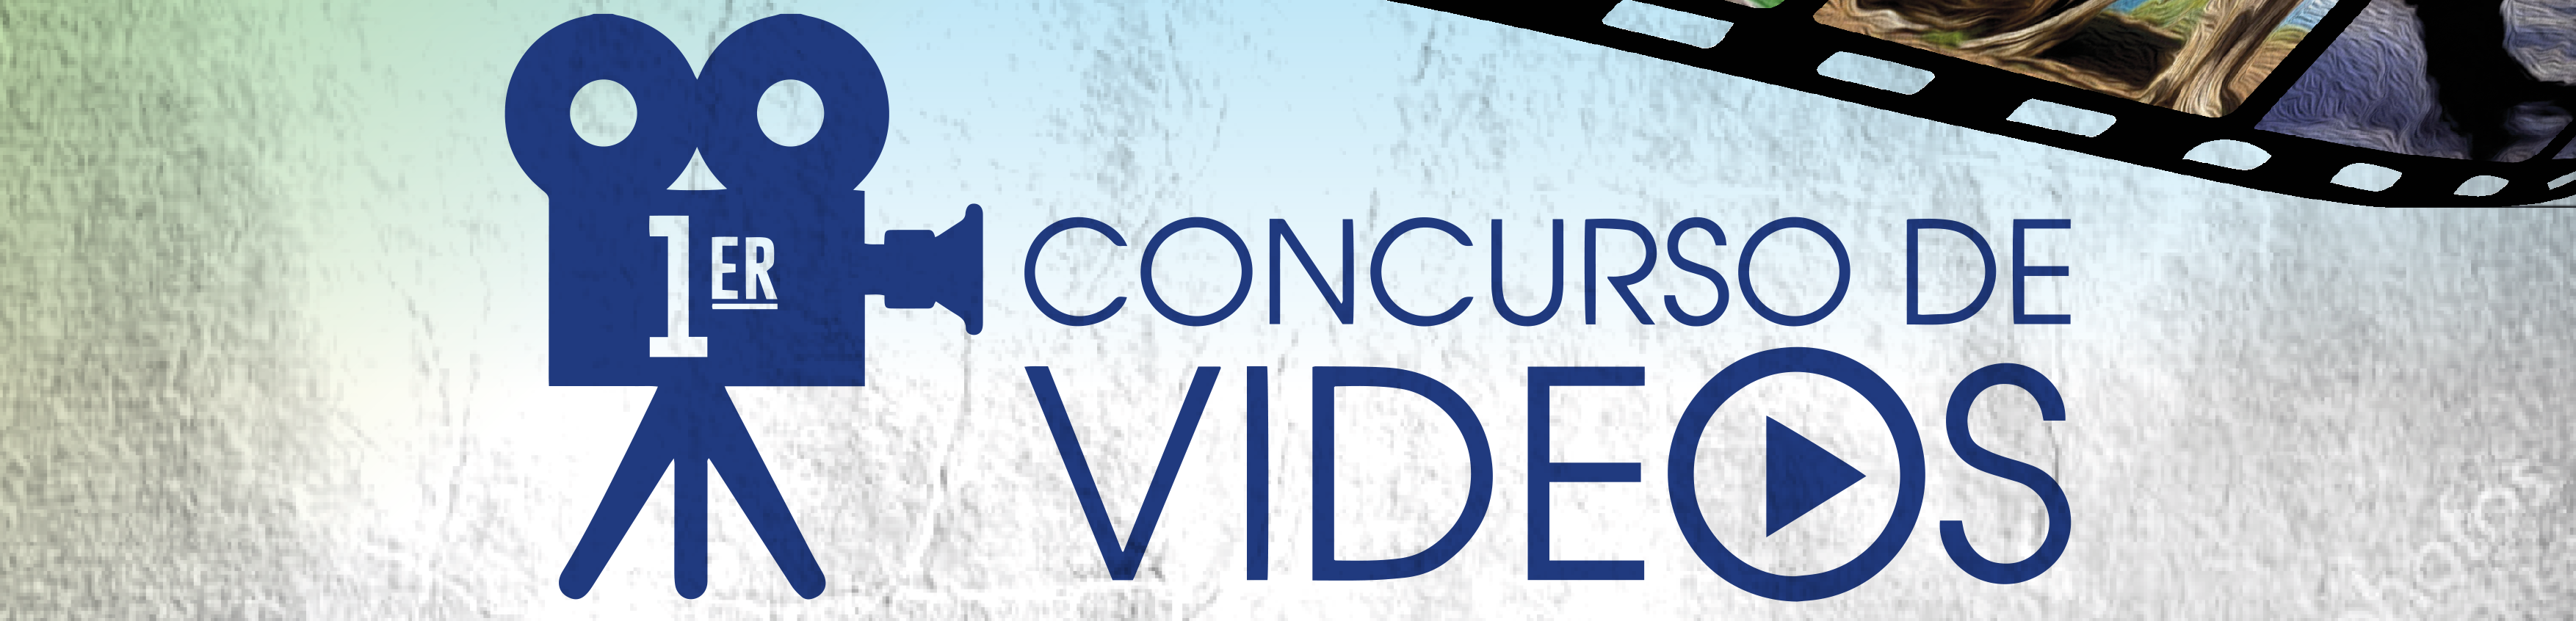 Concurso de Vídeos SGI